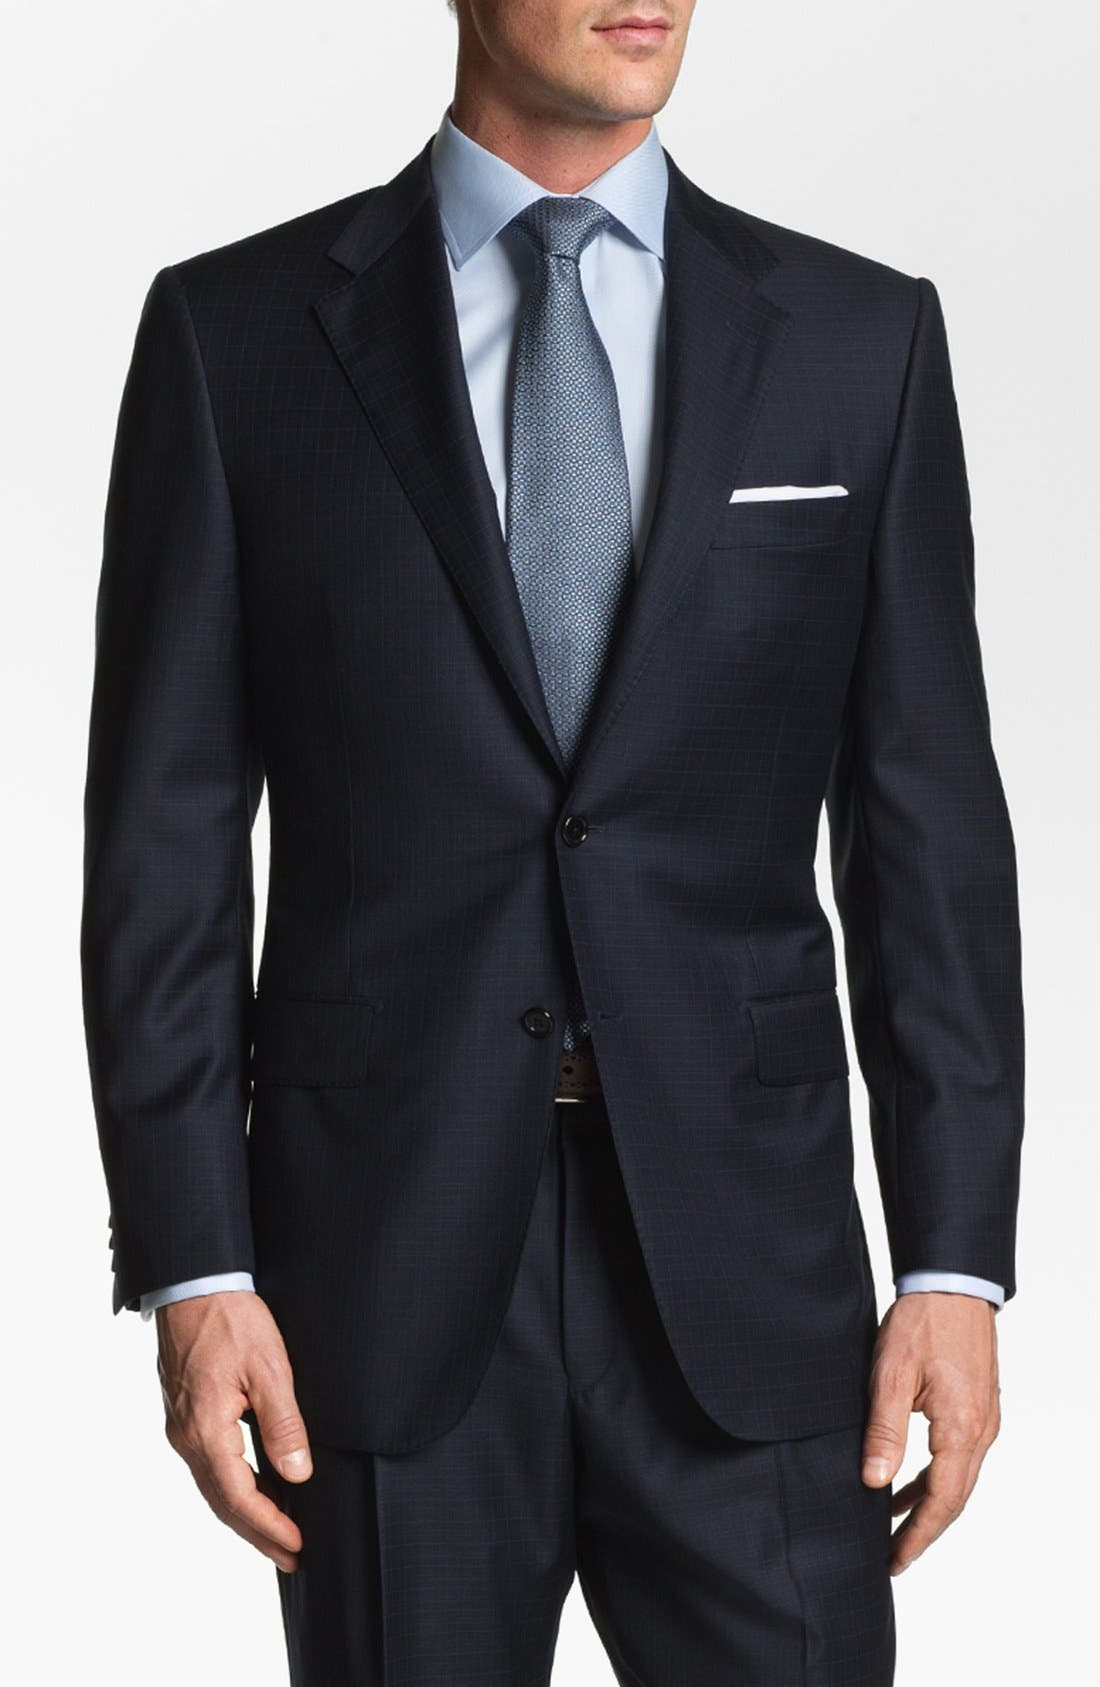 Main Image - Hickey Freeman 'Addison' Check Suit